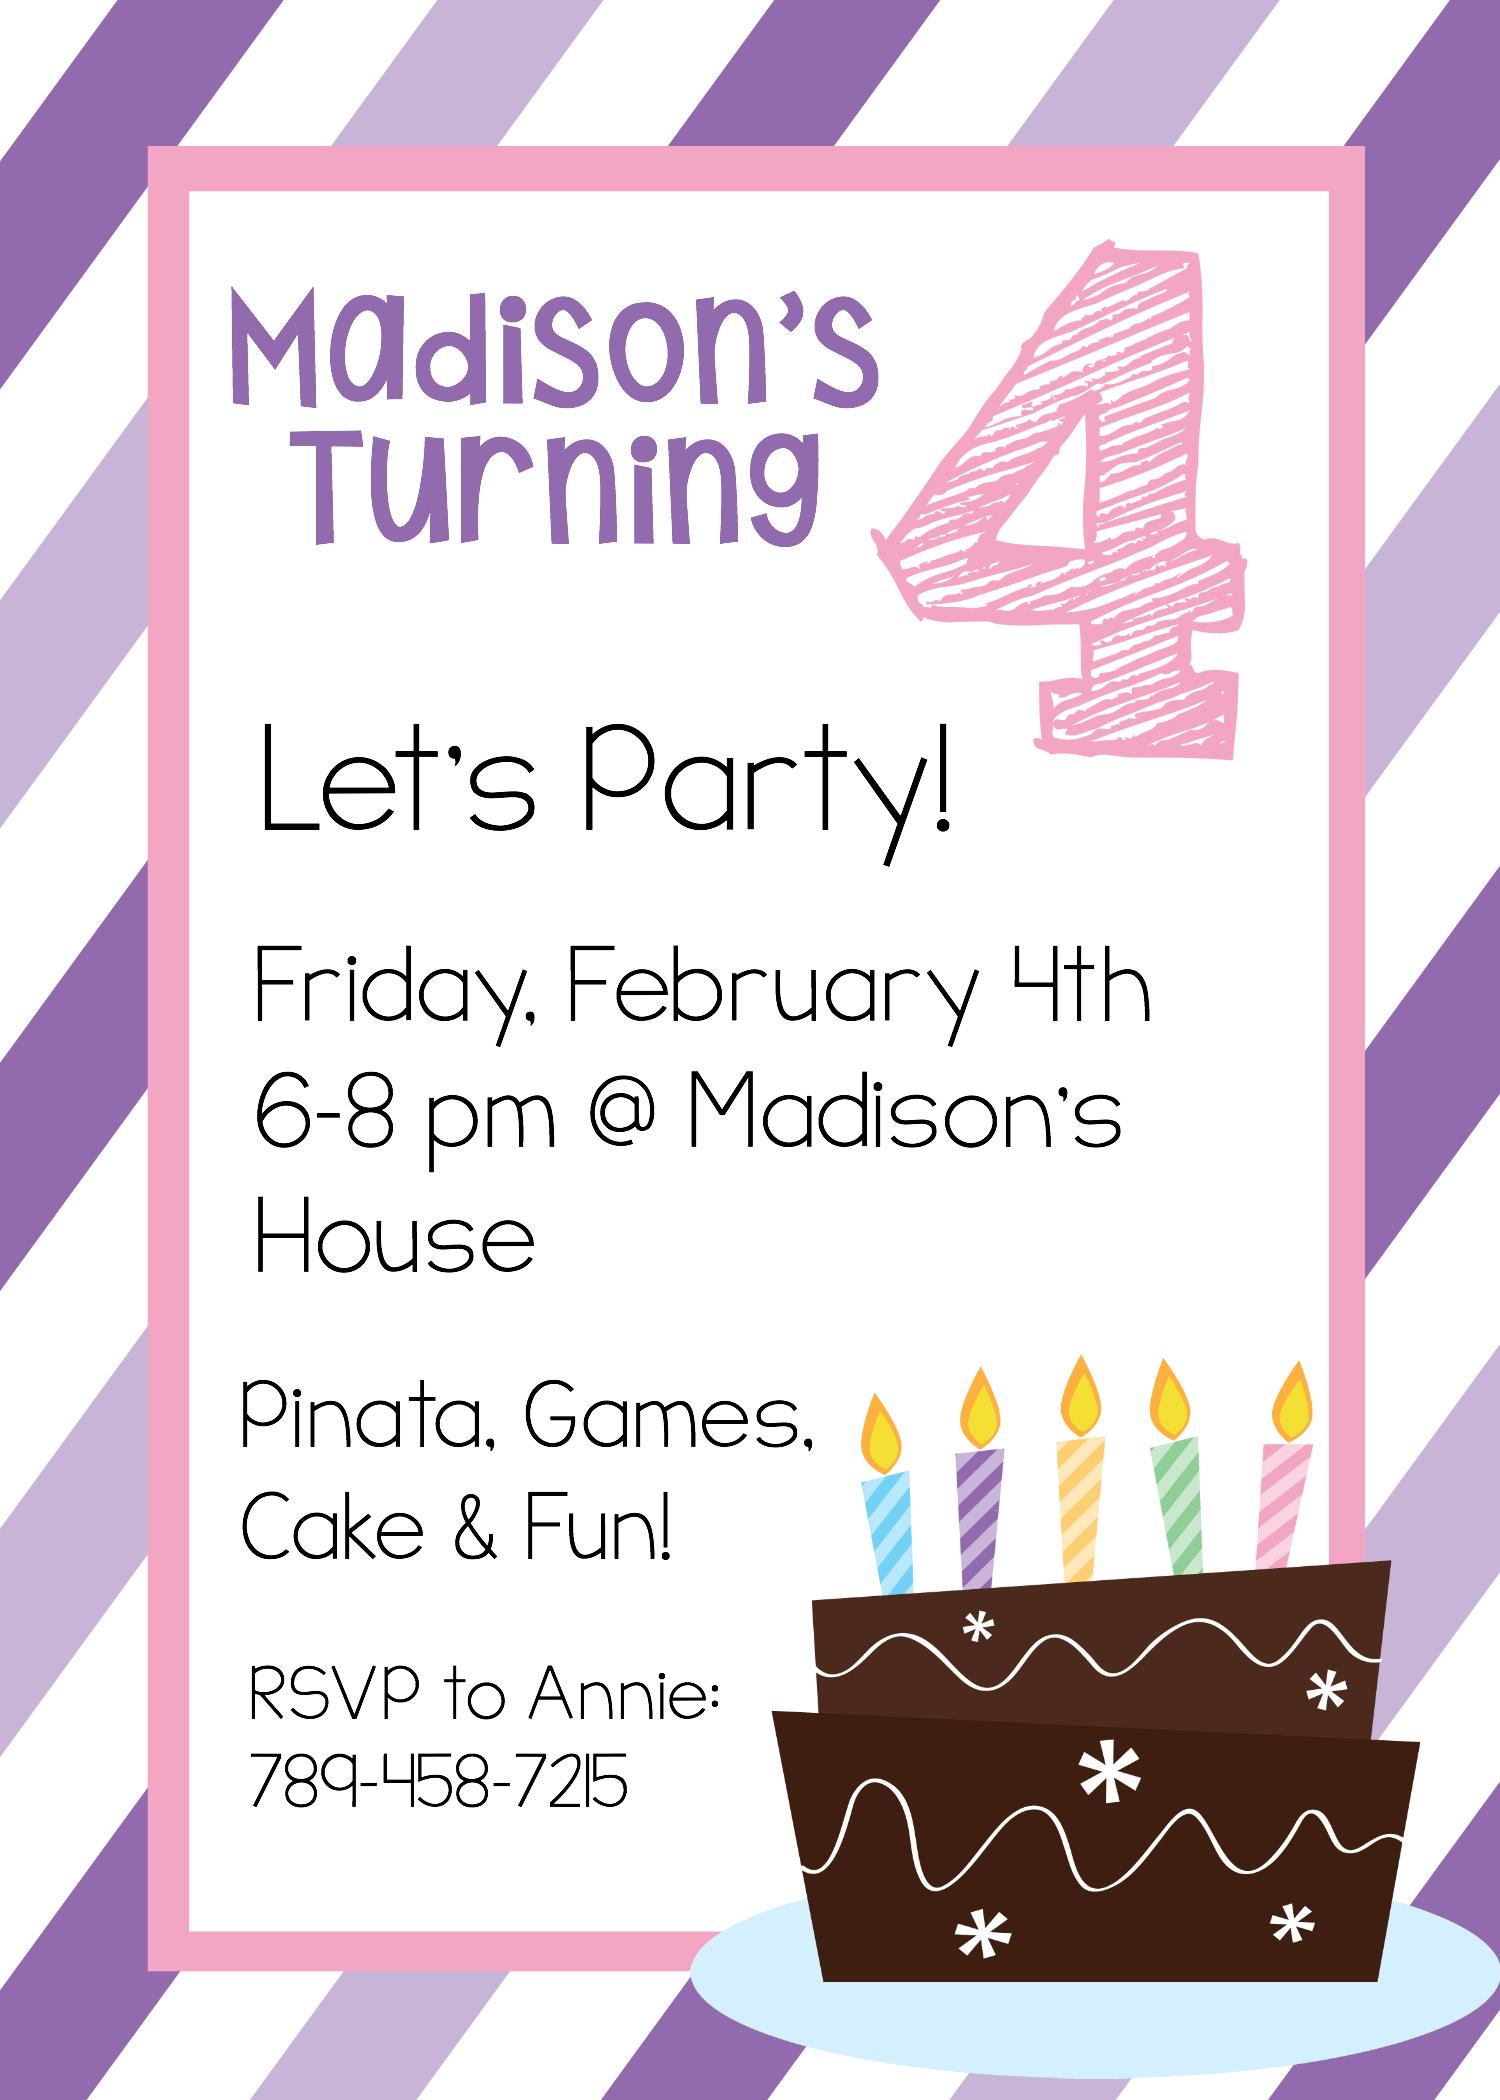 Free Printable Birthday Invitation Templates - Customized Birthday Cards Free Printable